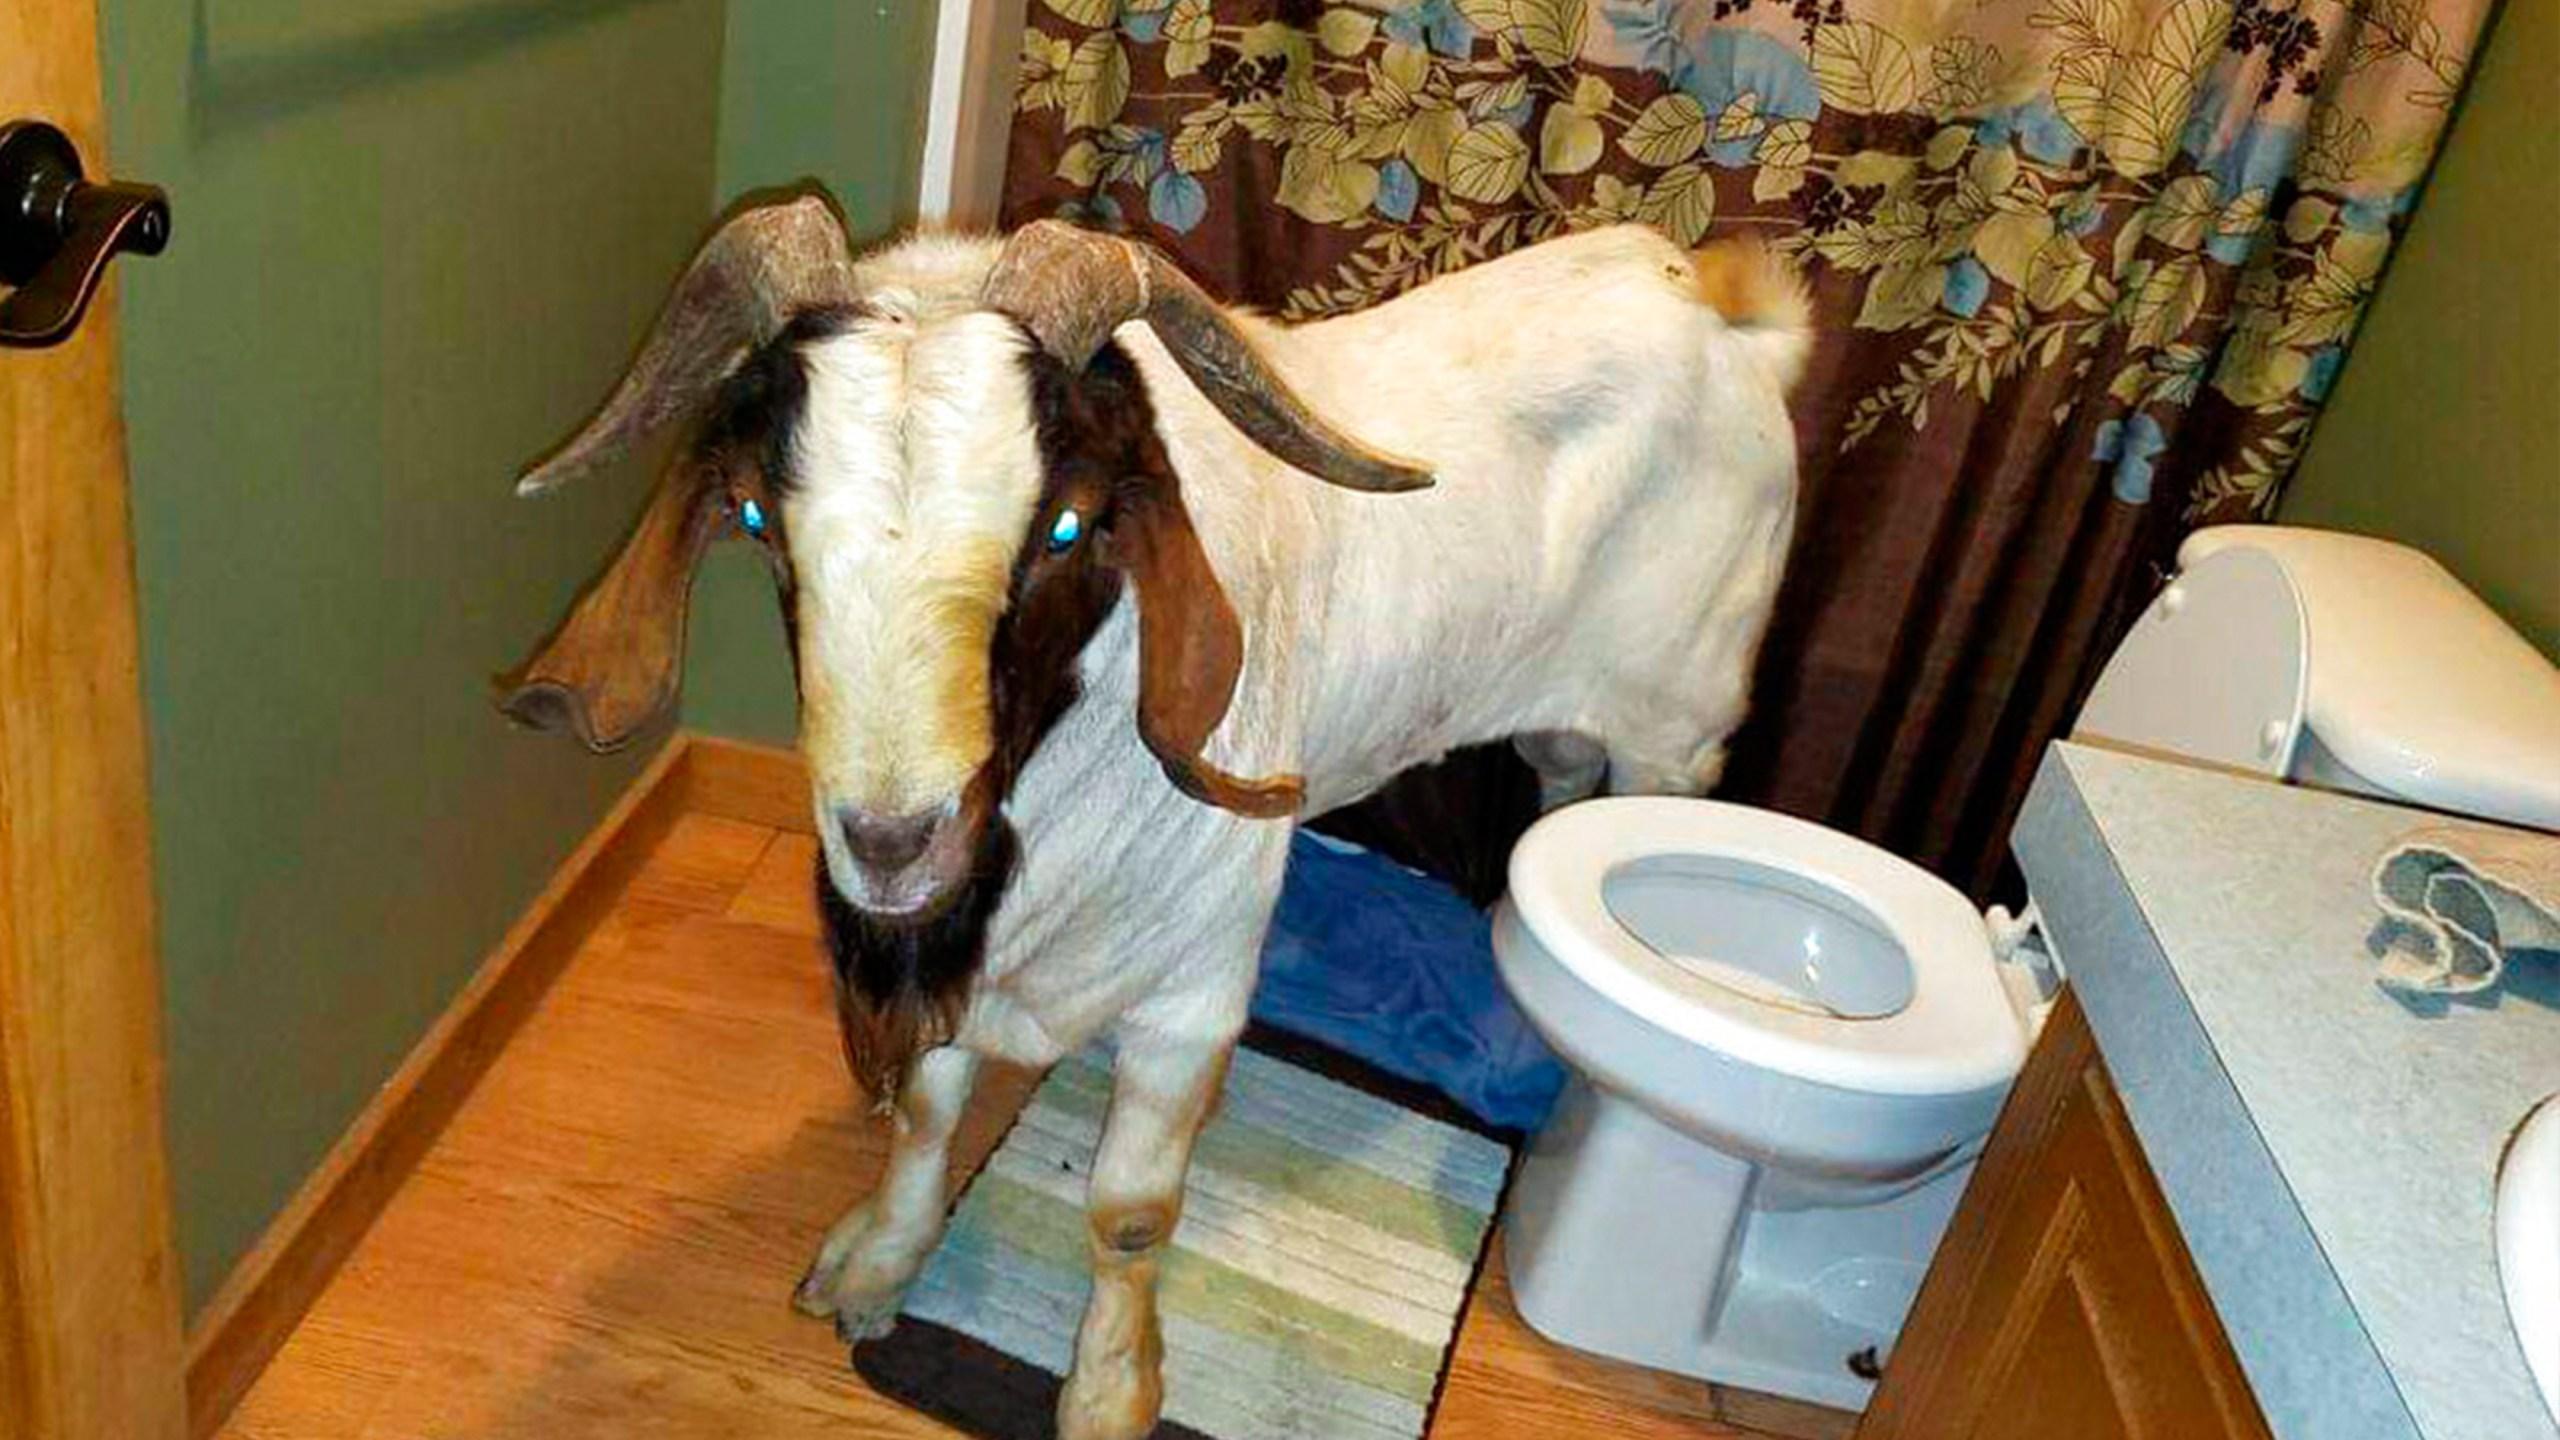 Goat rams through sliding glass door